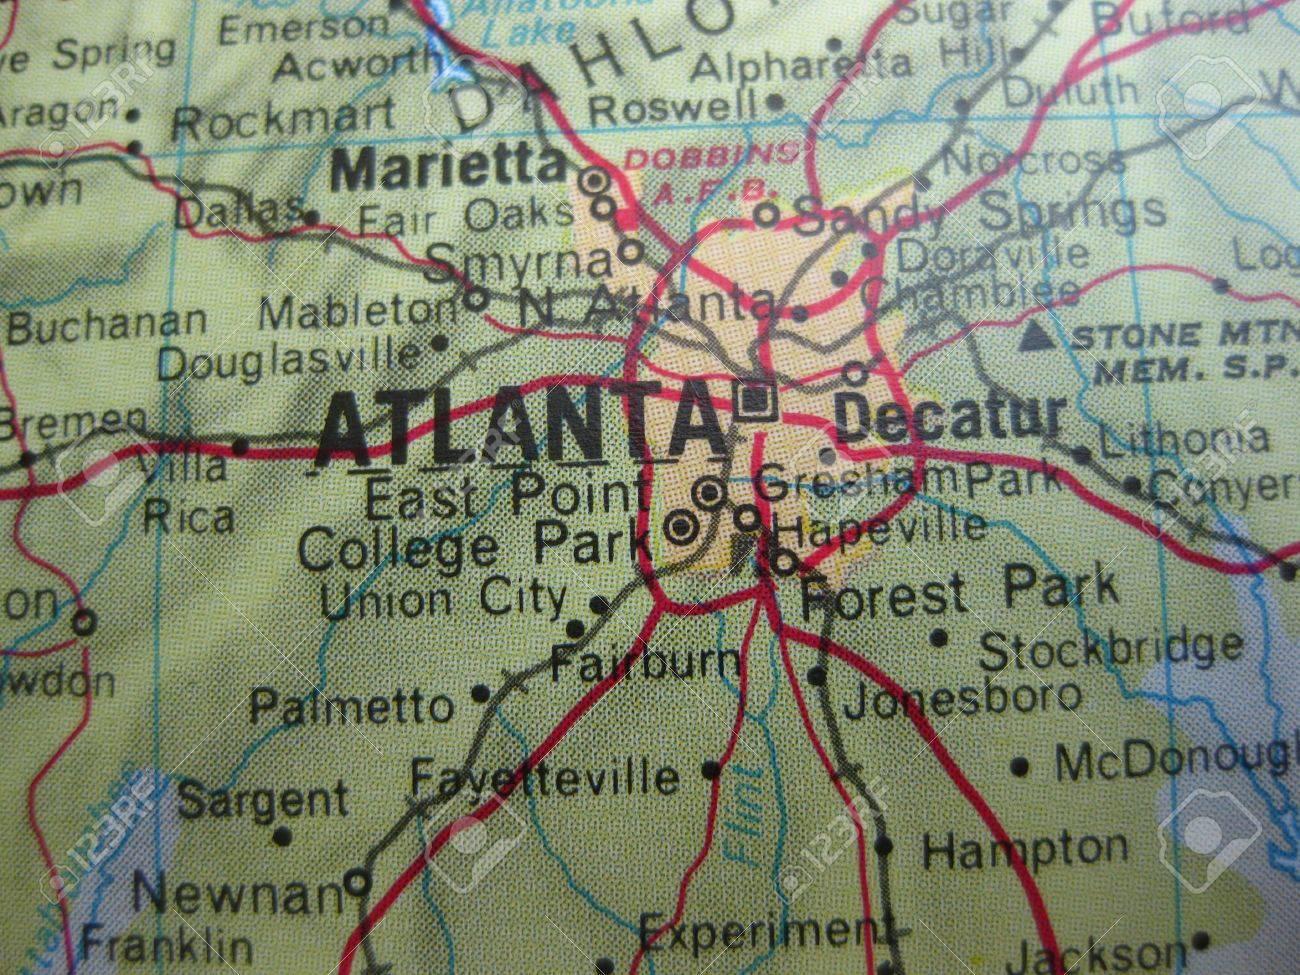 Map Of America Showing Atlanta.American Cities On Map Atlanta Georgia